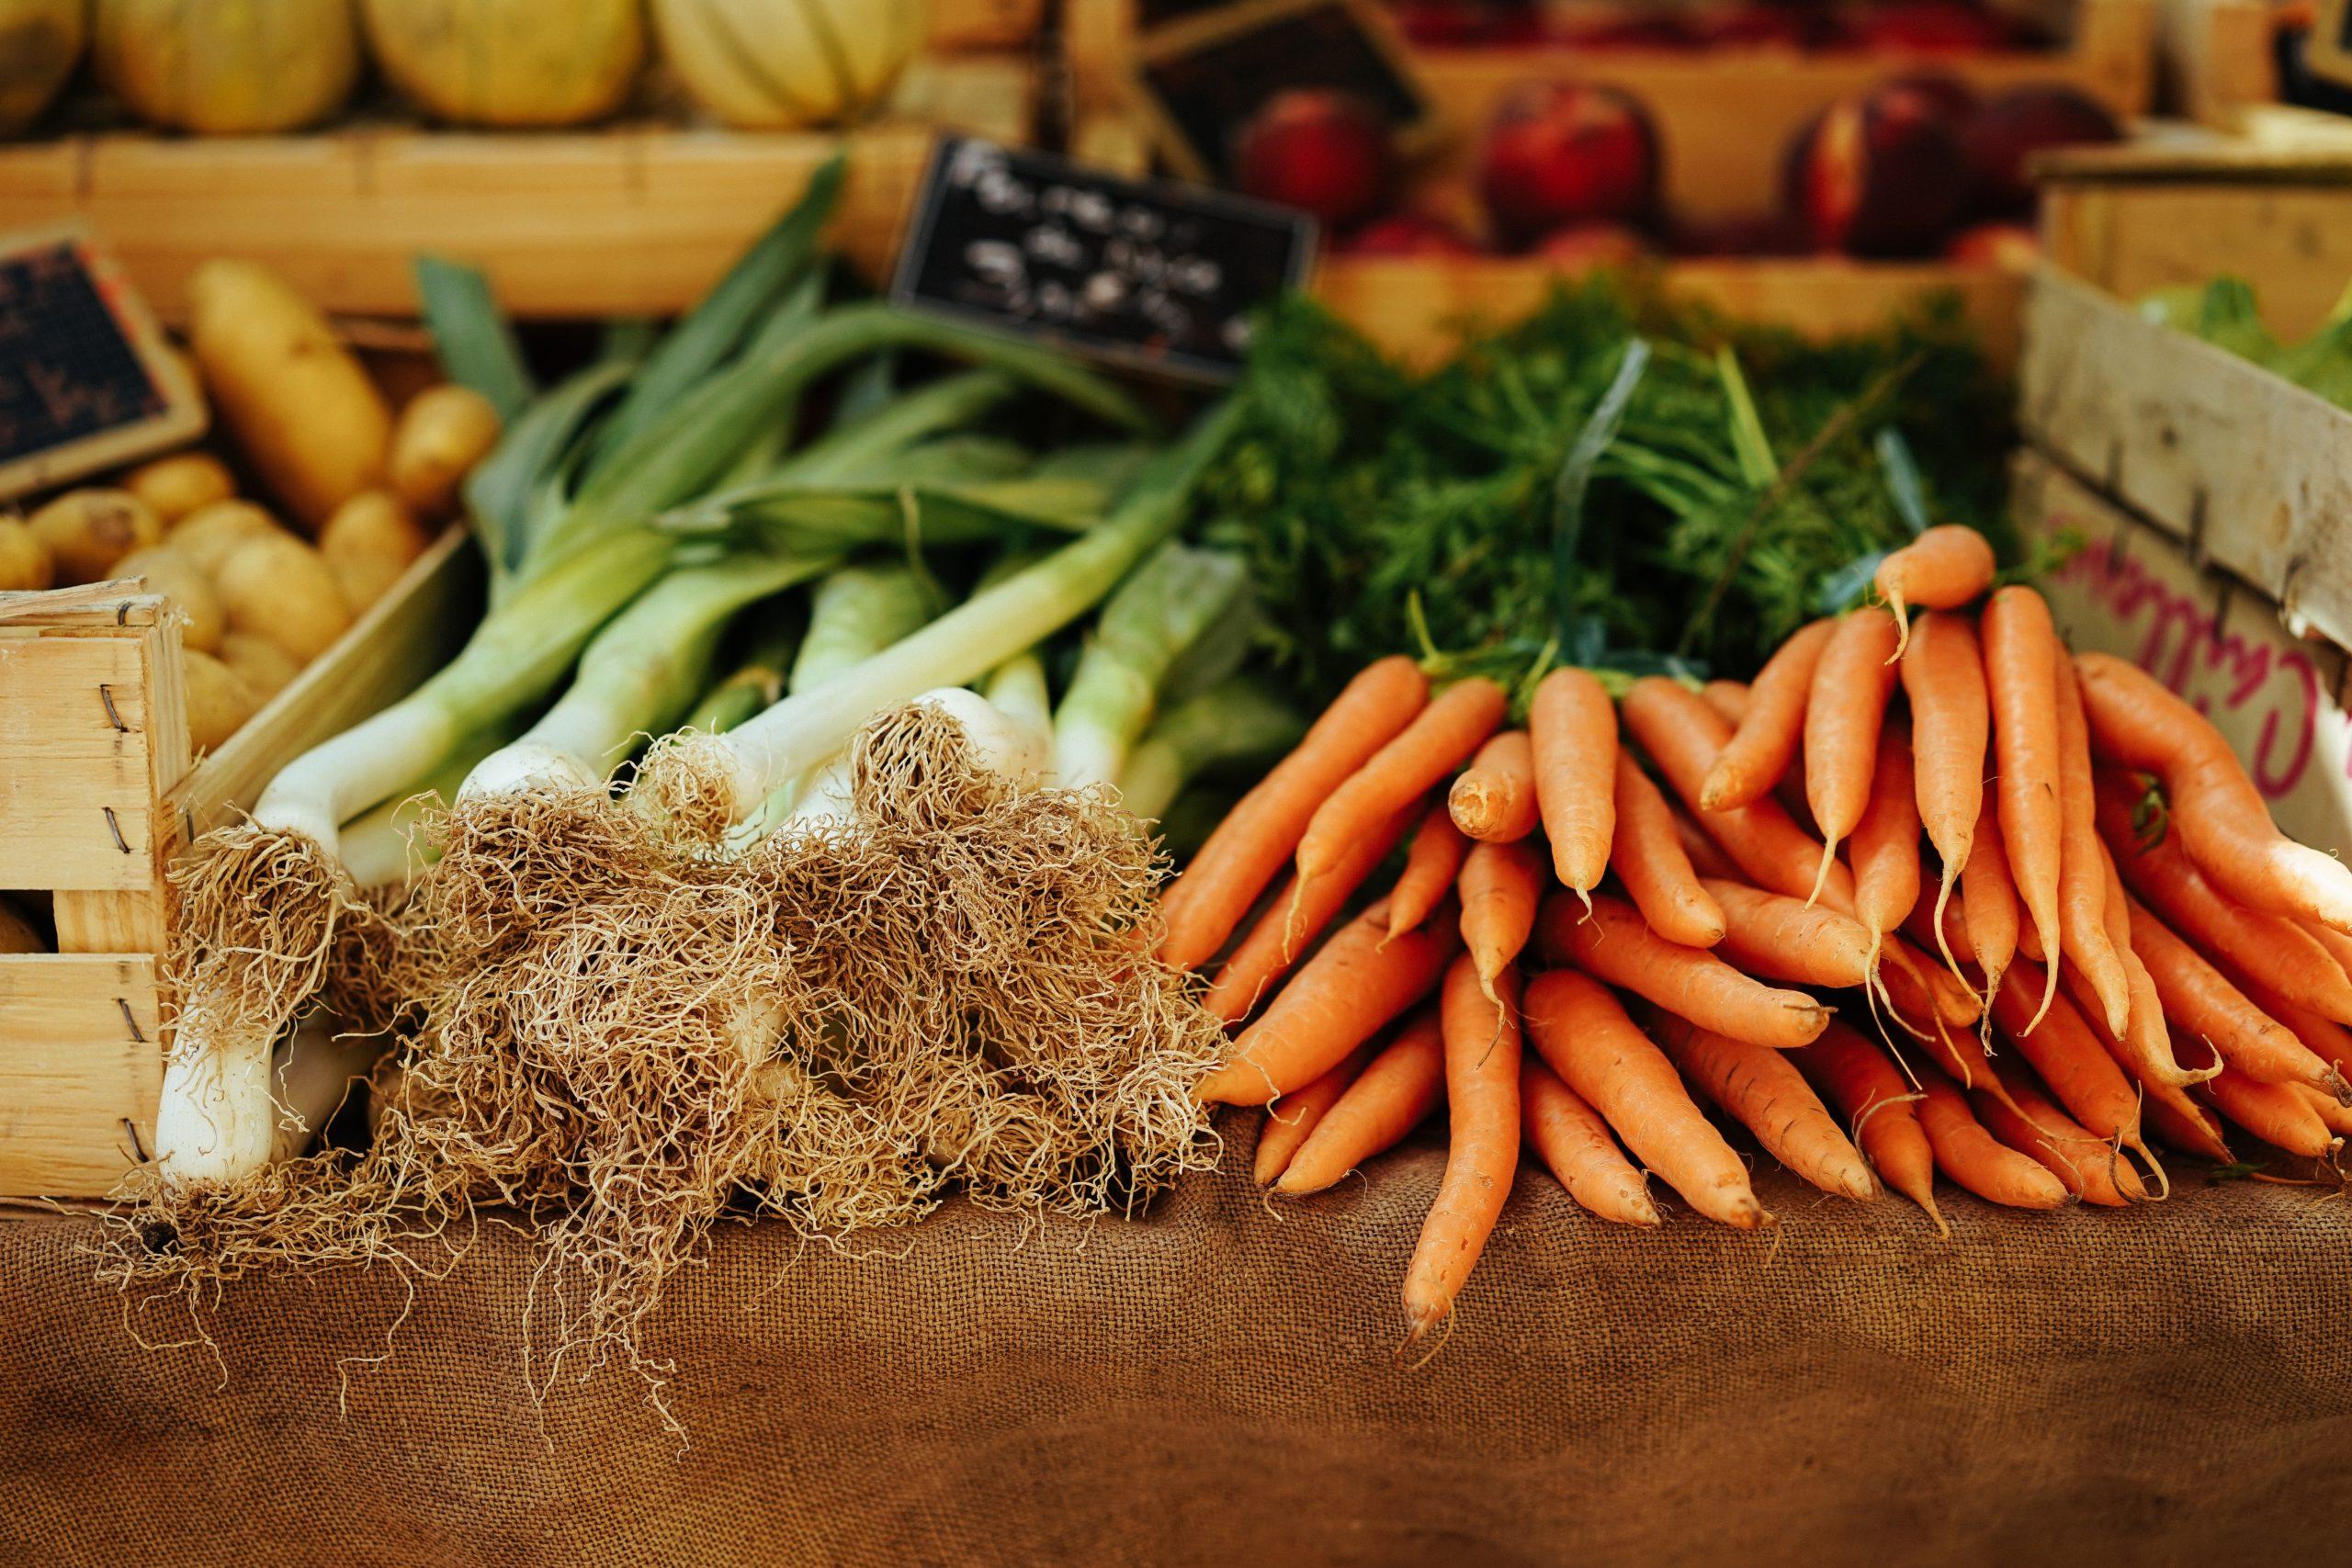 Healthy eating habits for Entrepreneurs